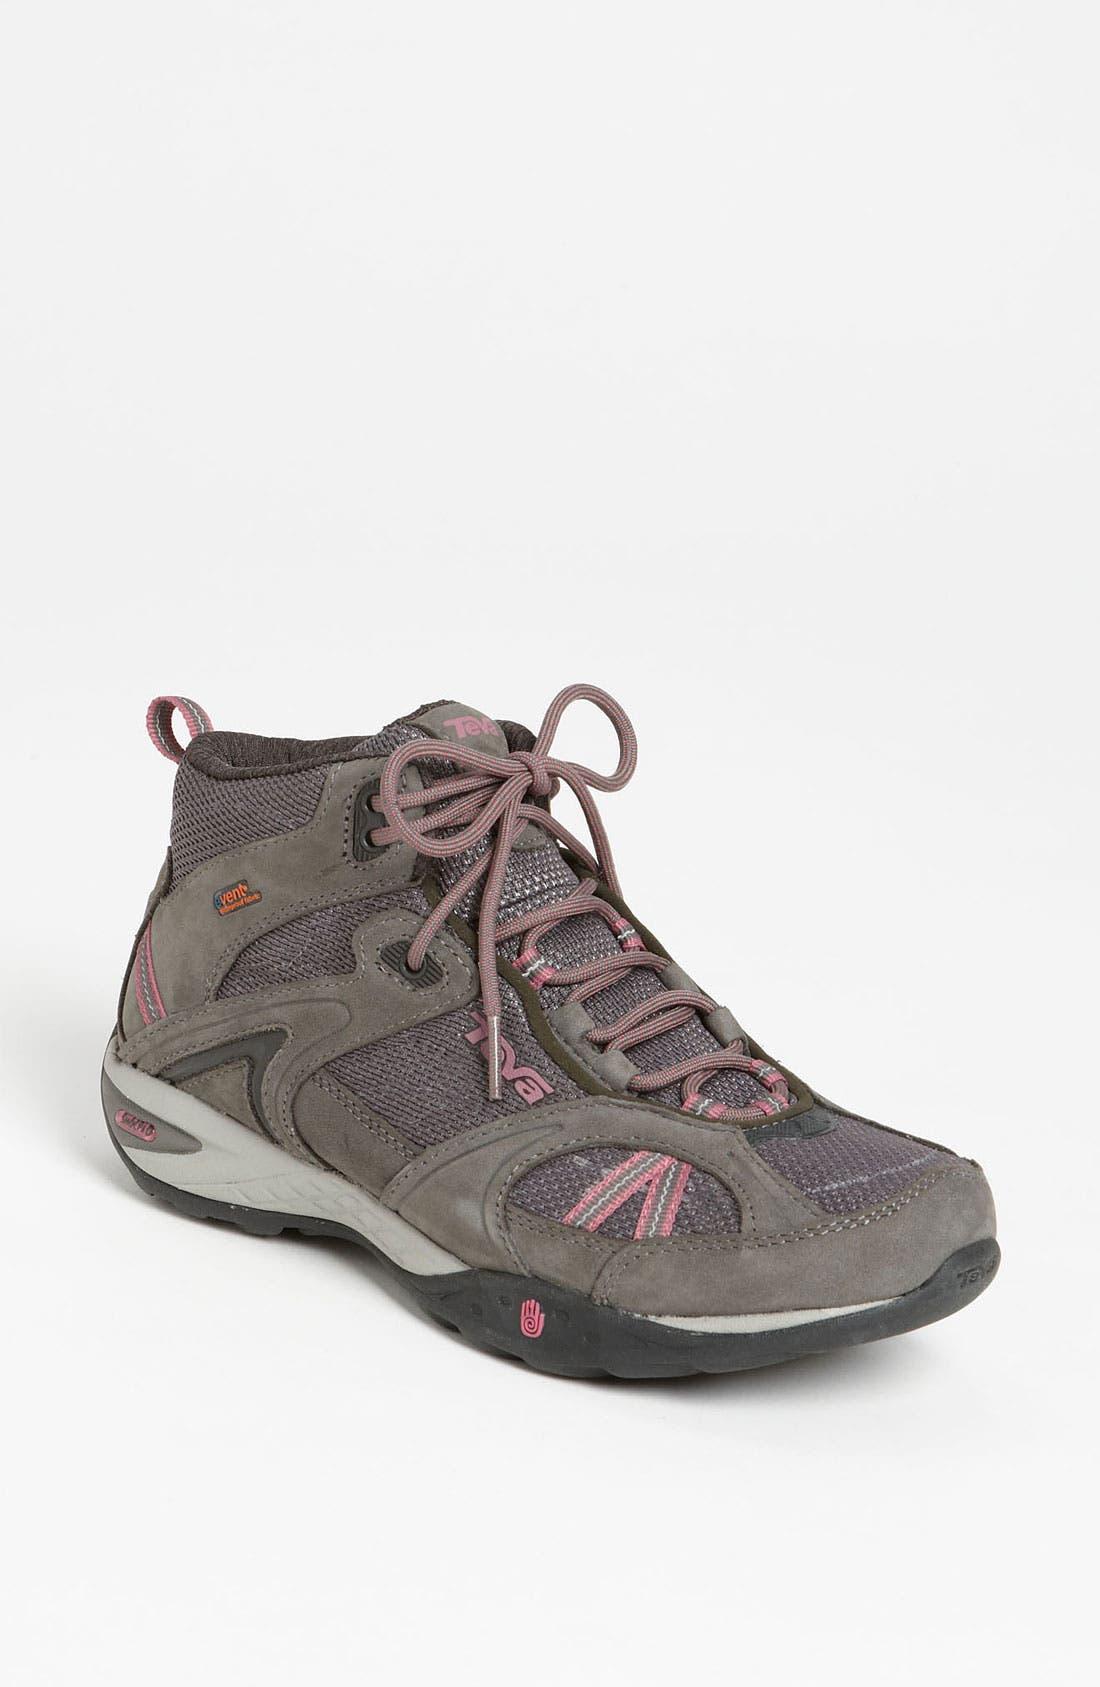 Alternate Image 1 Selected - Teva 'Sky Lake Mid eVent®' Hiking Boot (Women)